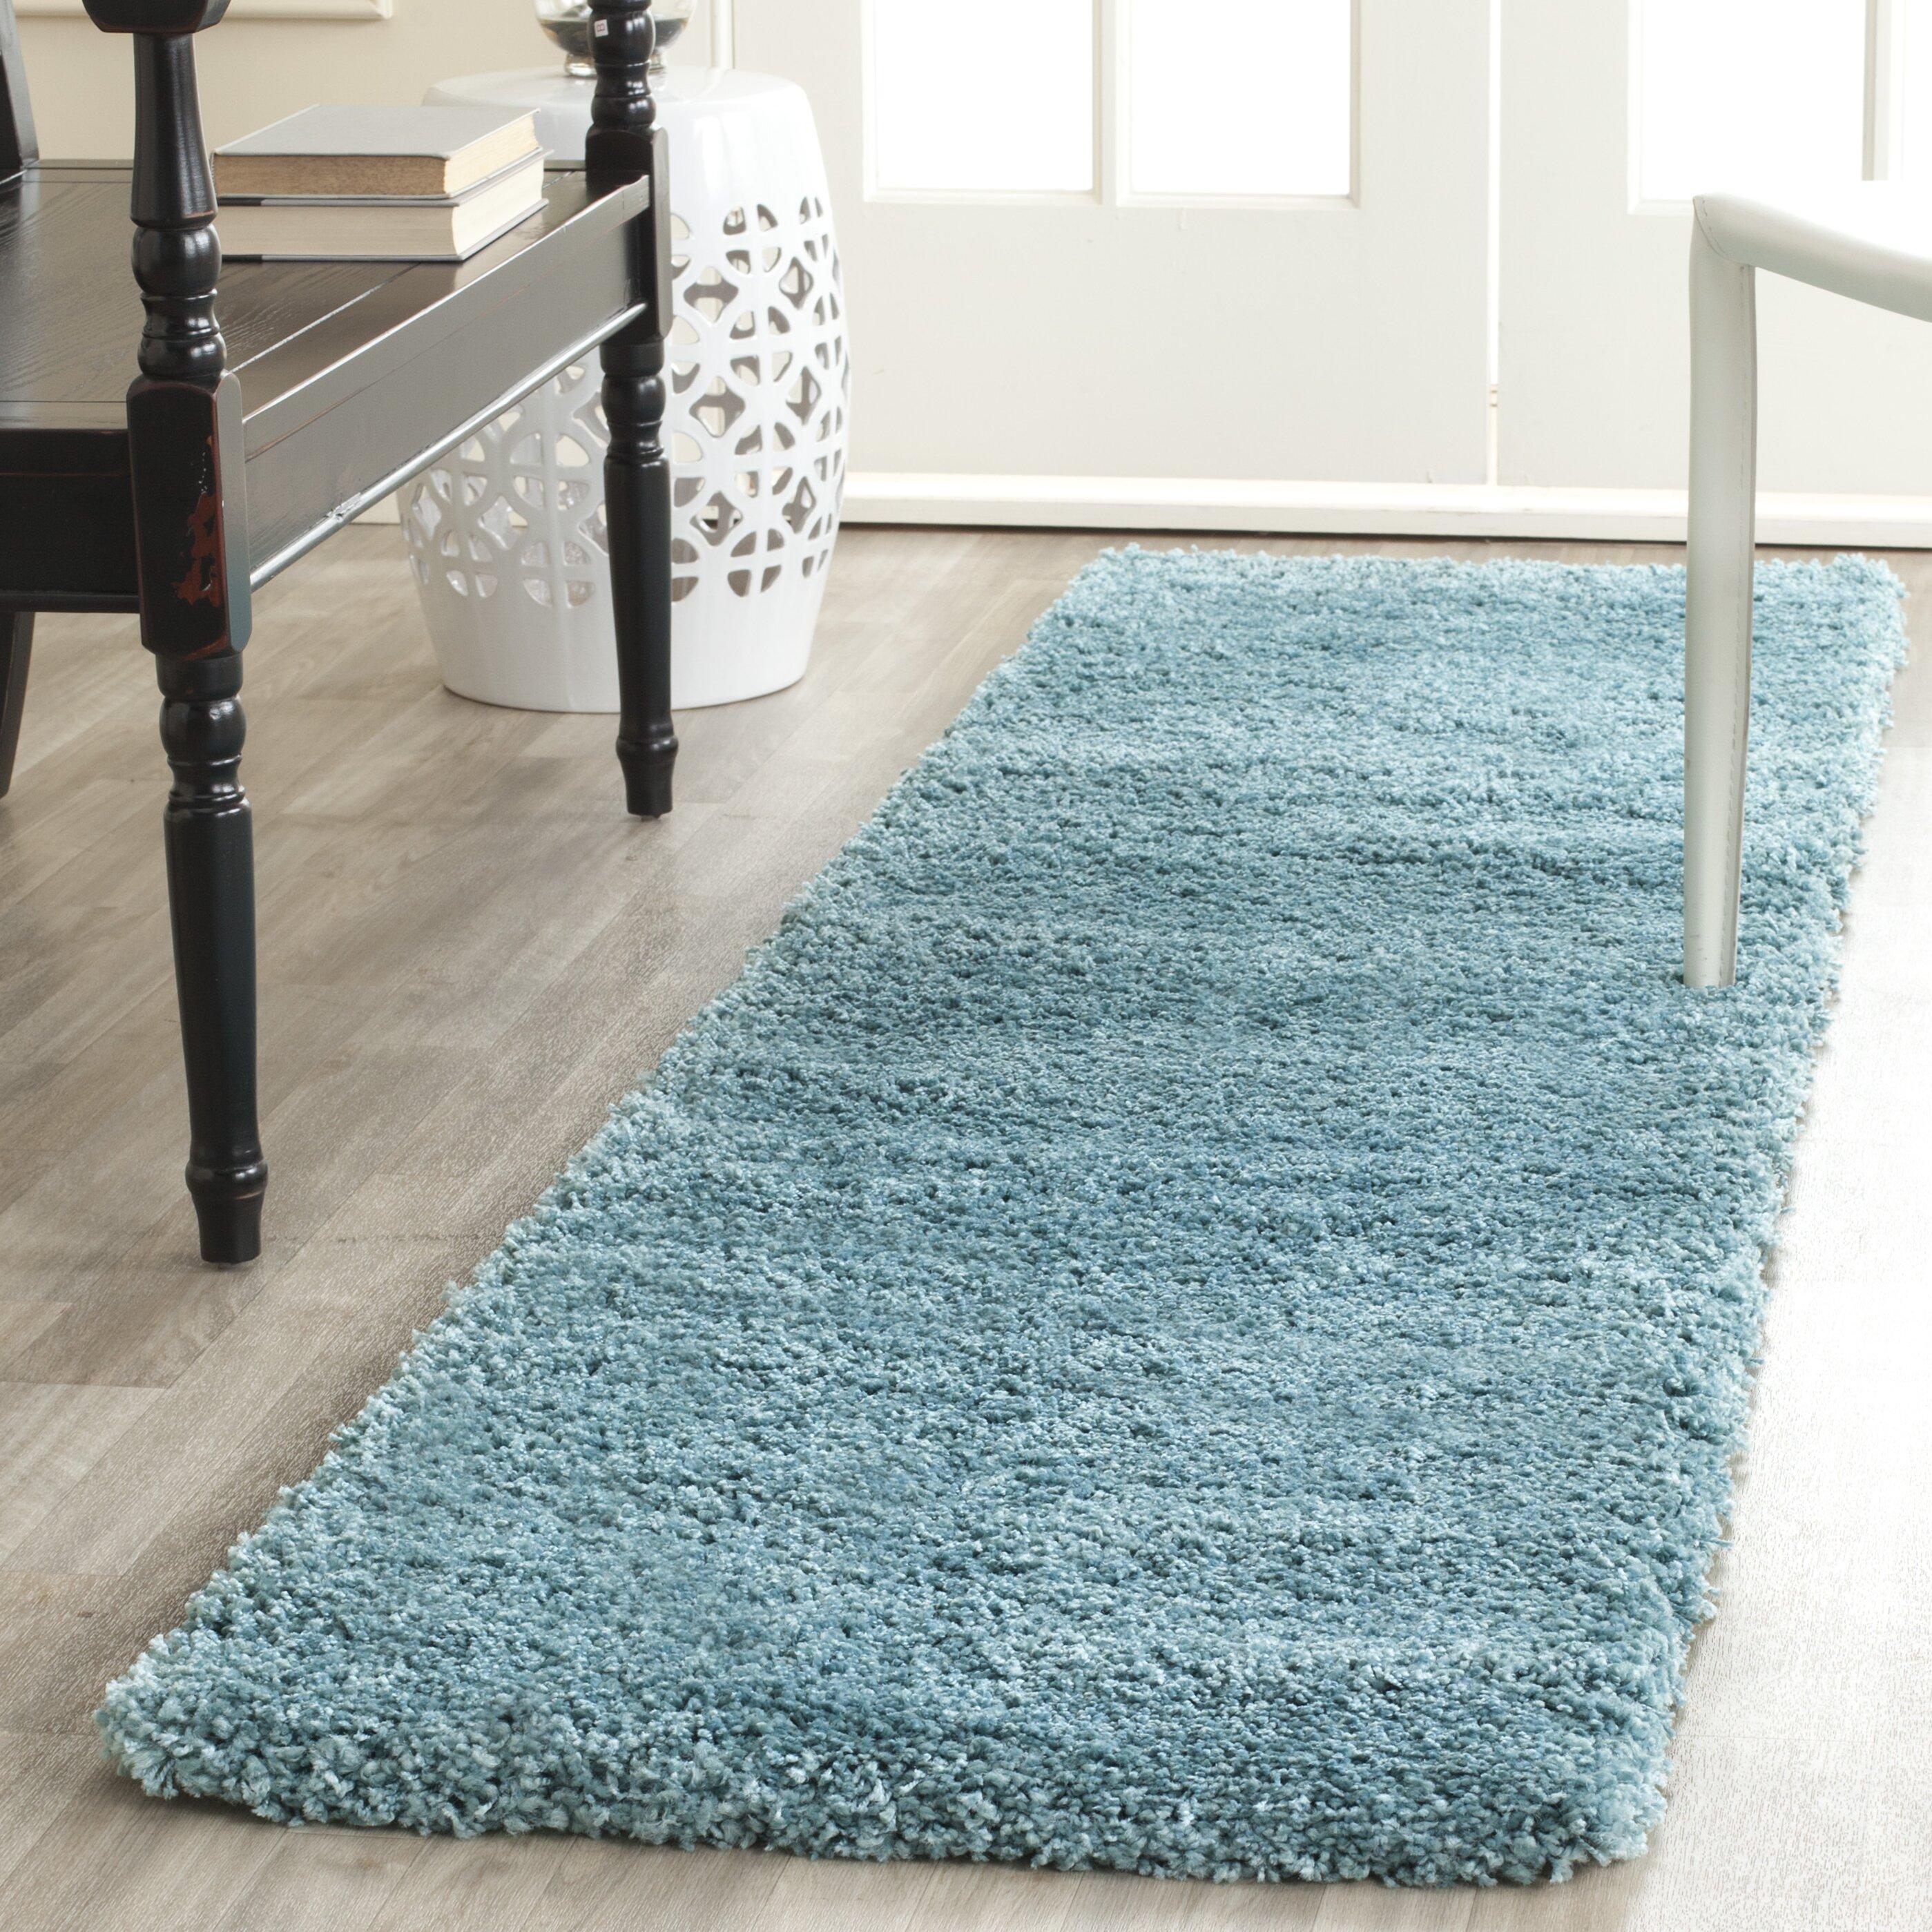 Safavieh Milan Shag Aqua Blue Area Rug & Reviews | Wayfair